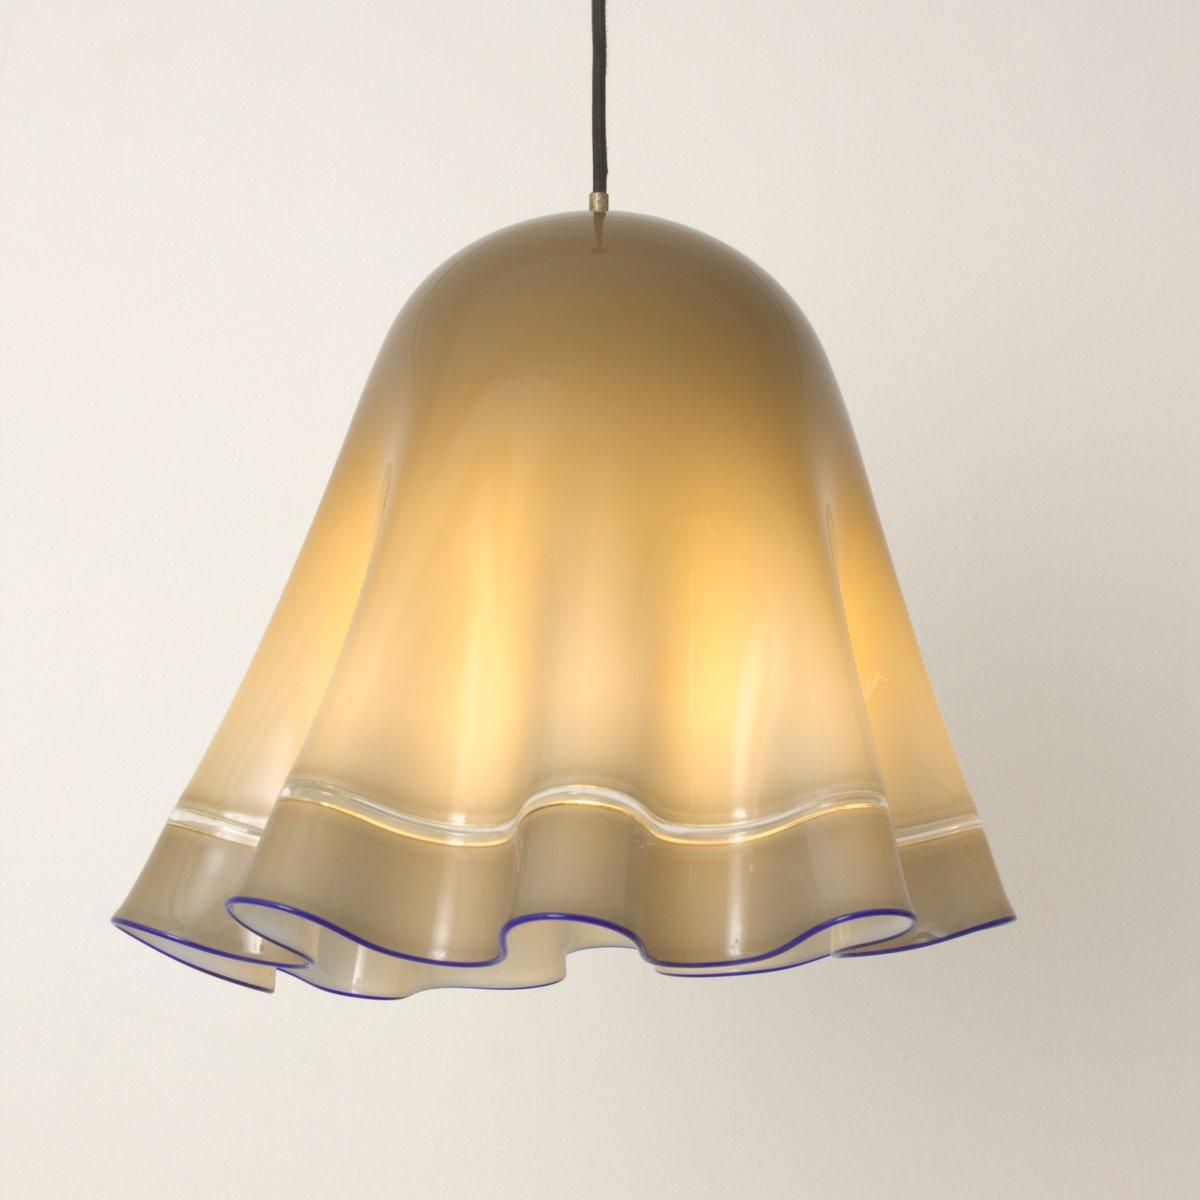 Vintage grey blue murano glass pendant lamp for sale at pamono vintage grey blue murano glass pendant lamp aloadofball Image collections